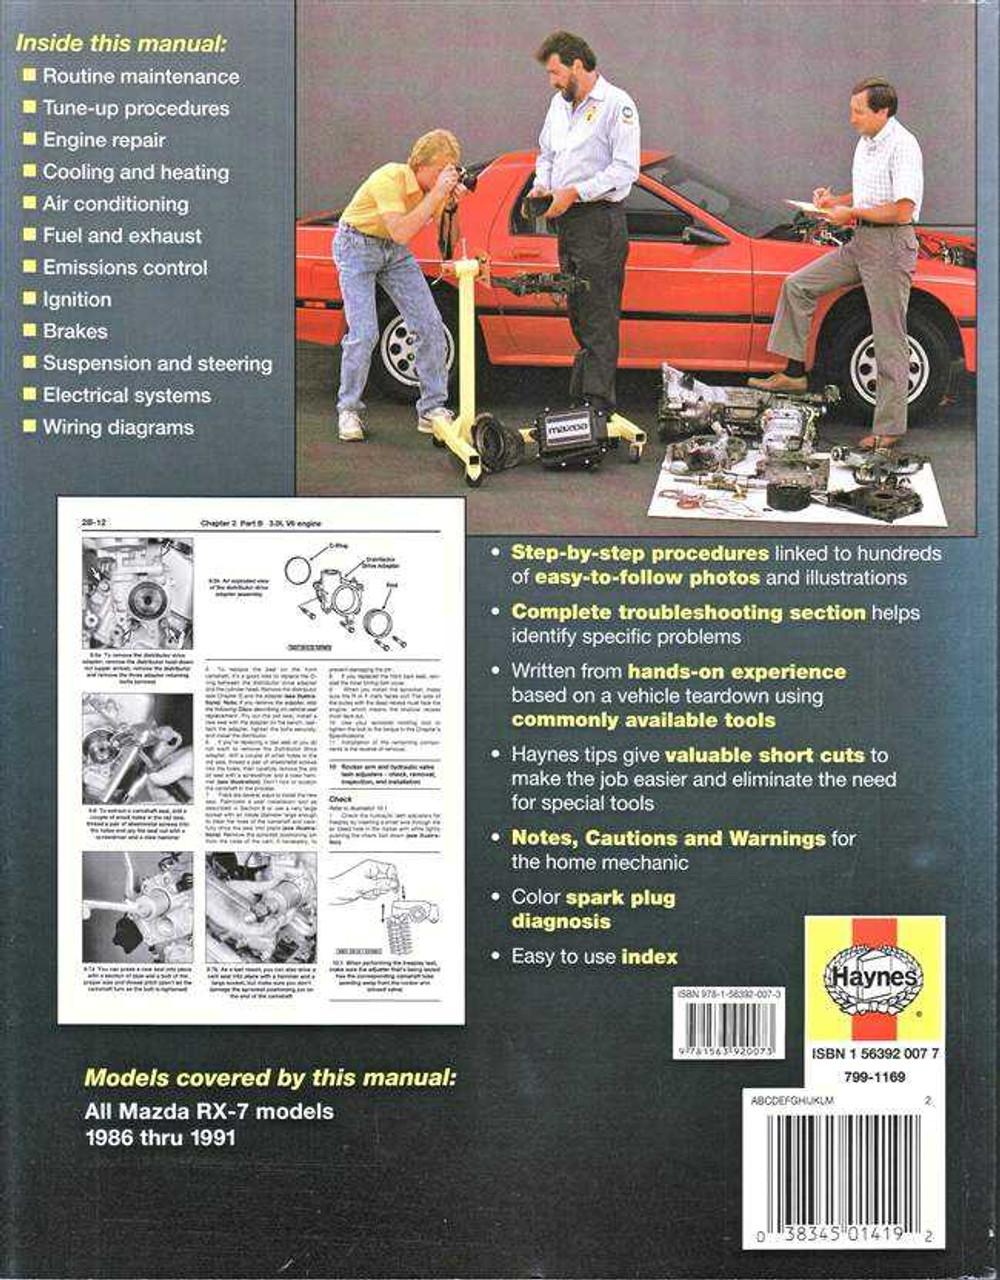 Mazda rx 7 1986 1991 workshop manual asfbconference2016 Choice Image